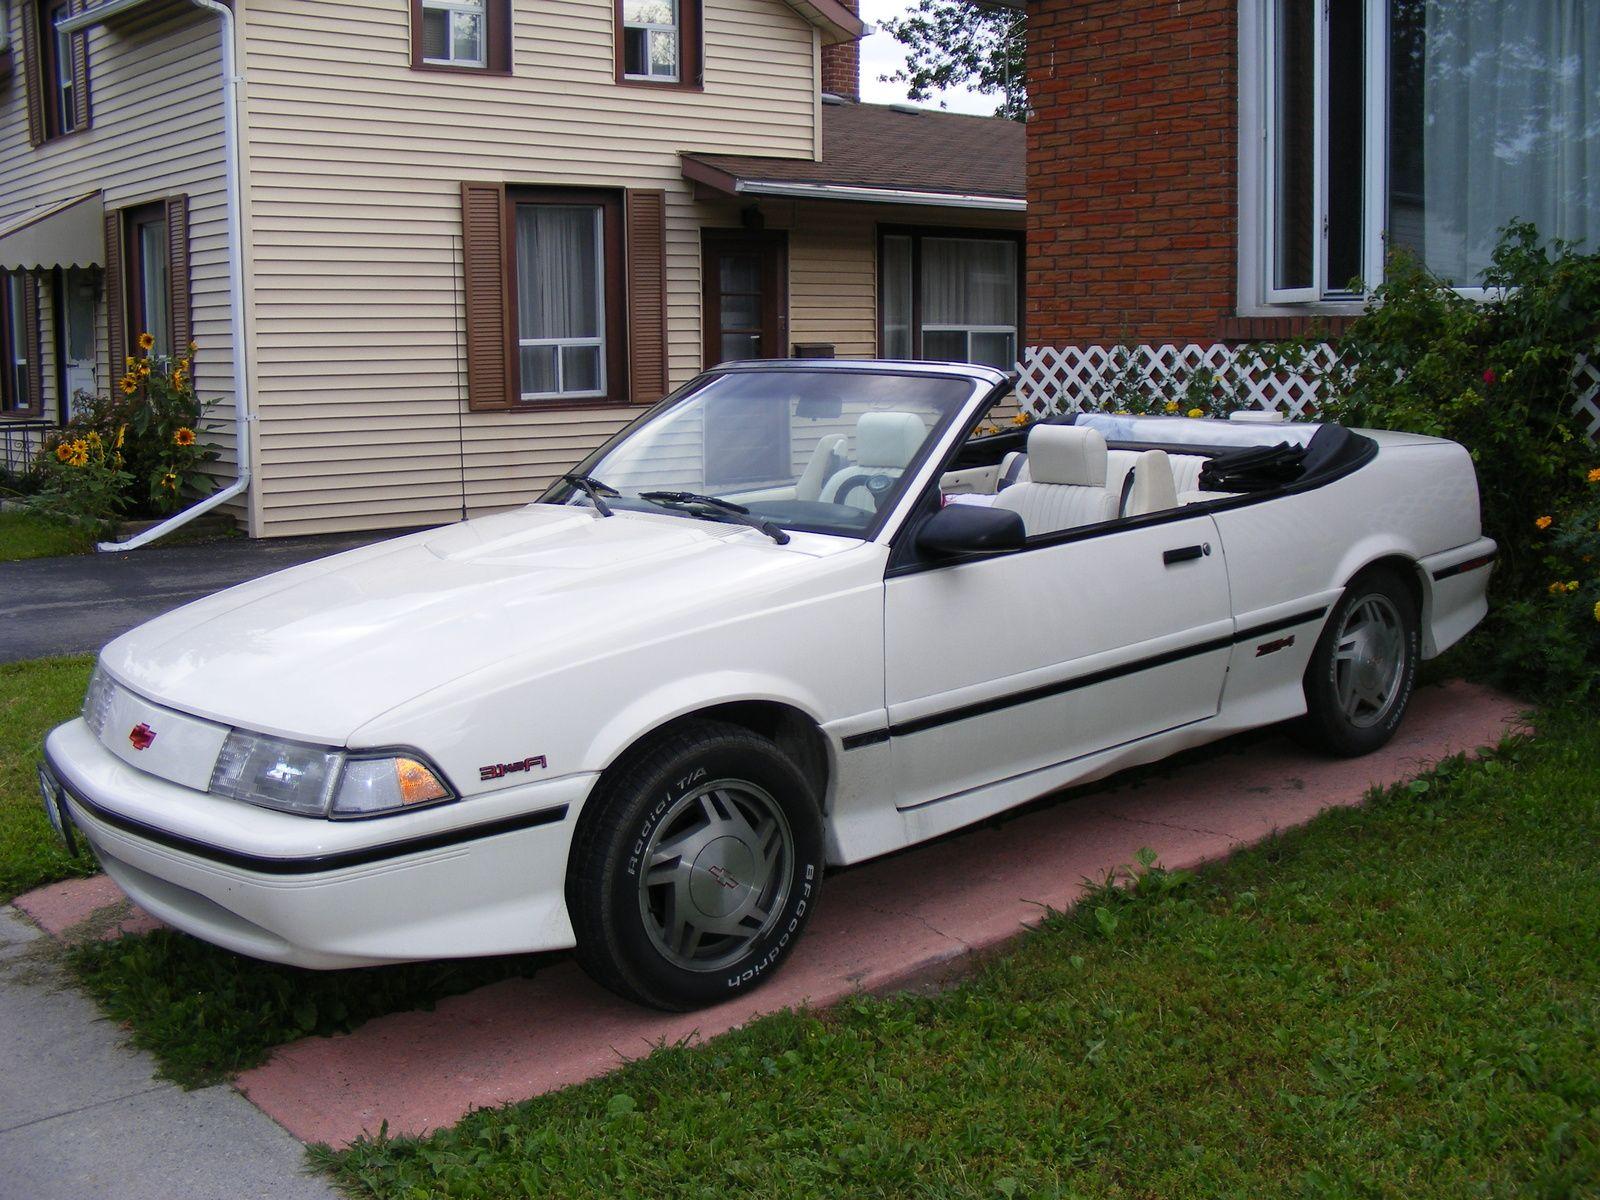 1992 chevrolet cavalier z24 convertible